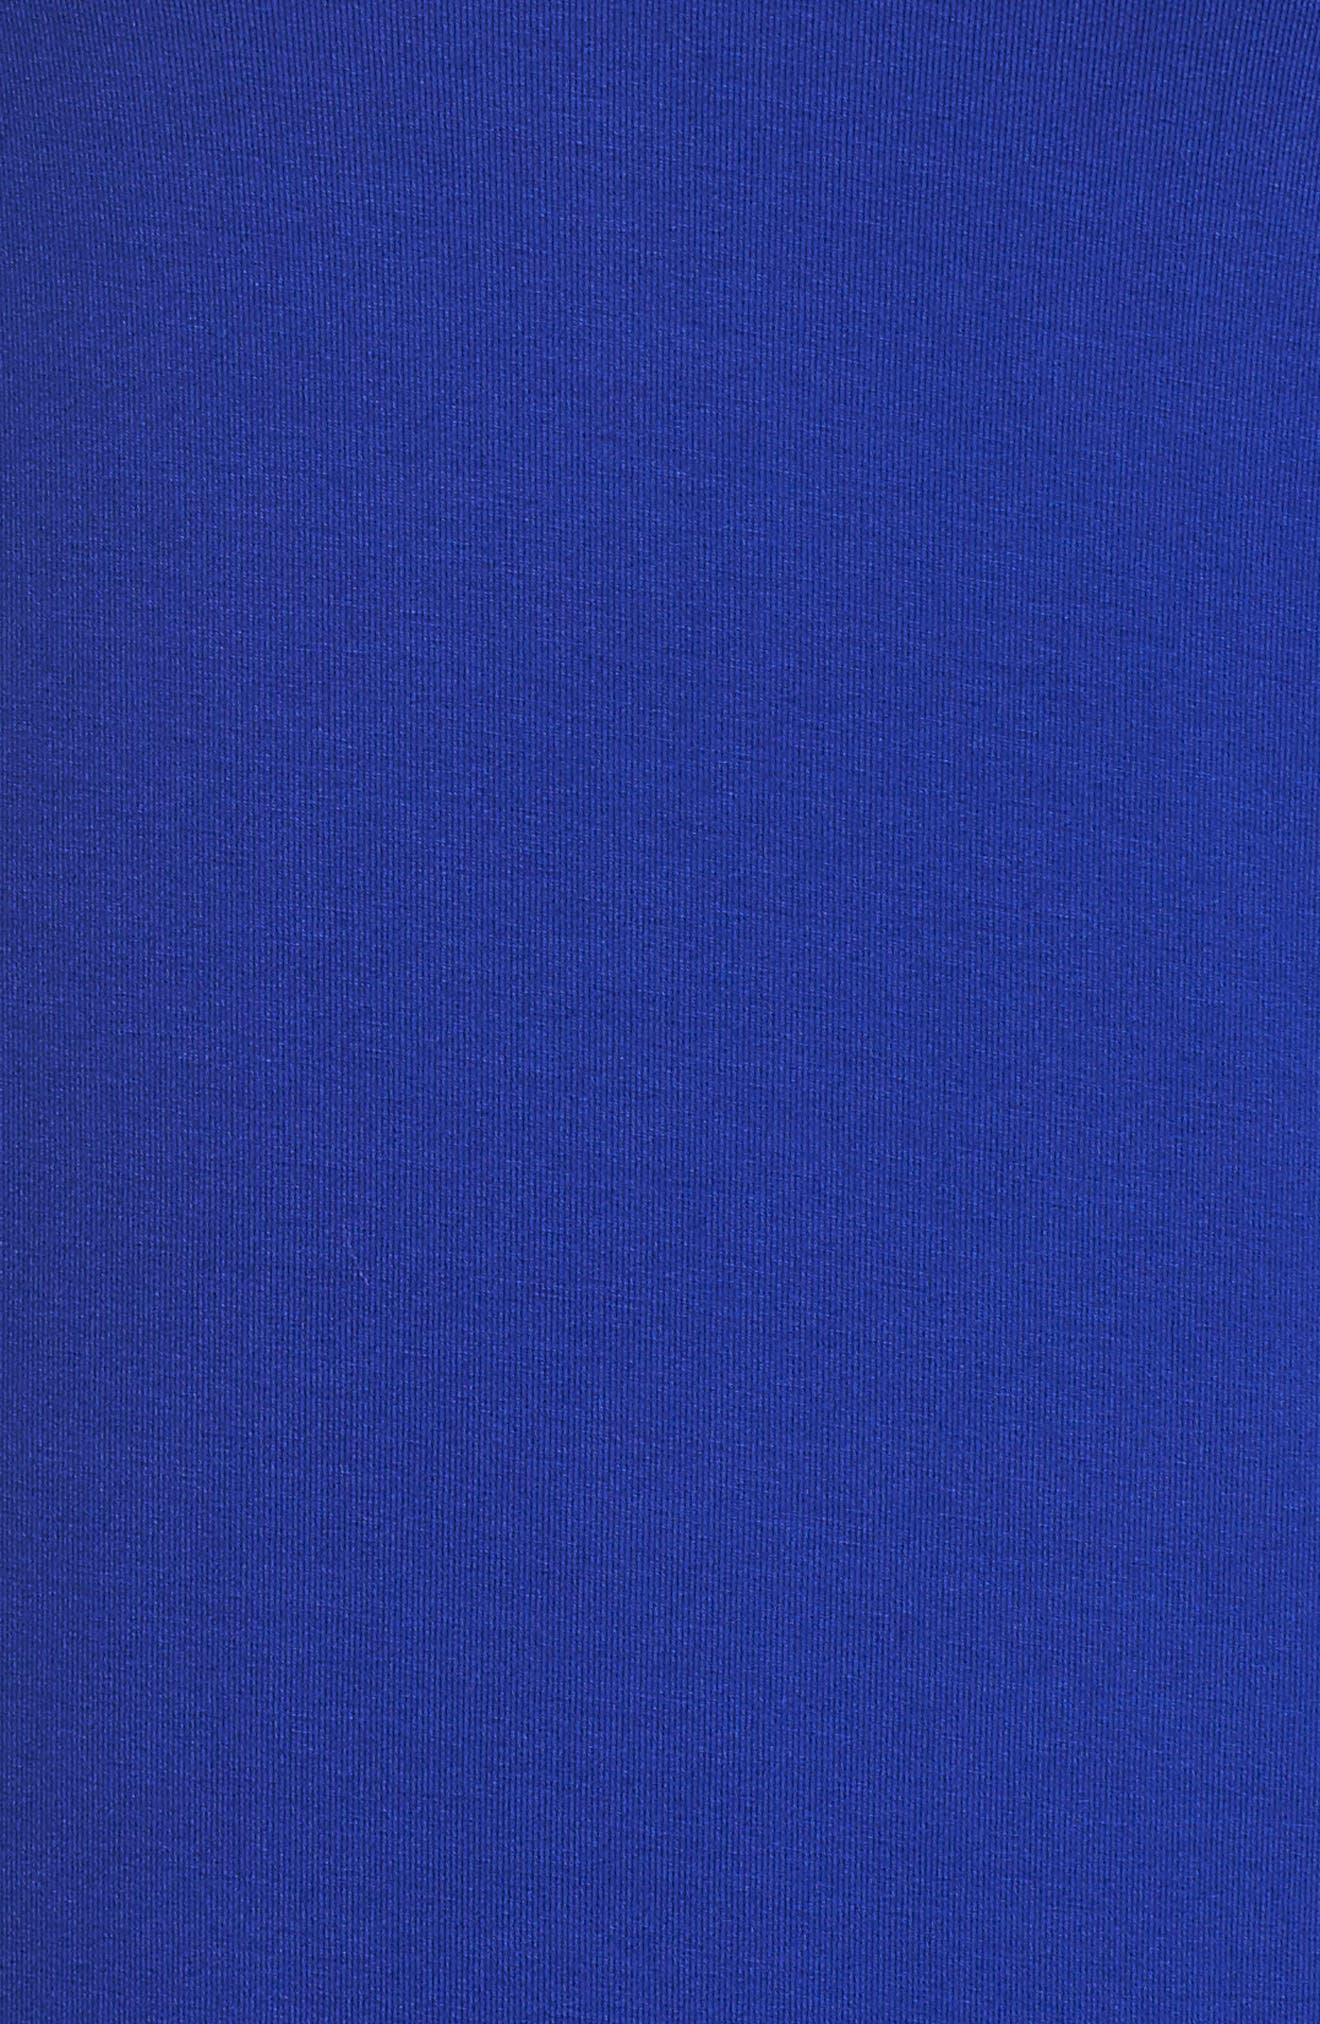 Lula Ruffle Sleeve Dress,                             Alternate thumbnail 5, color,                             Twilight Blue